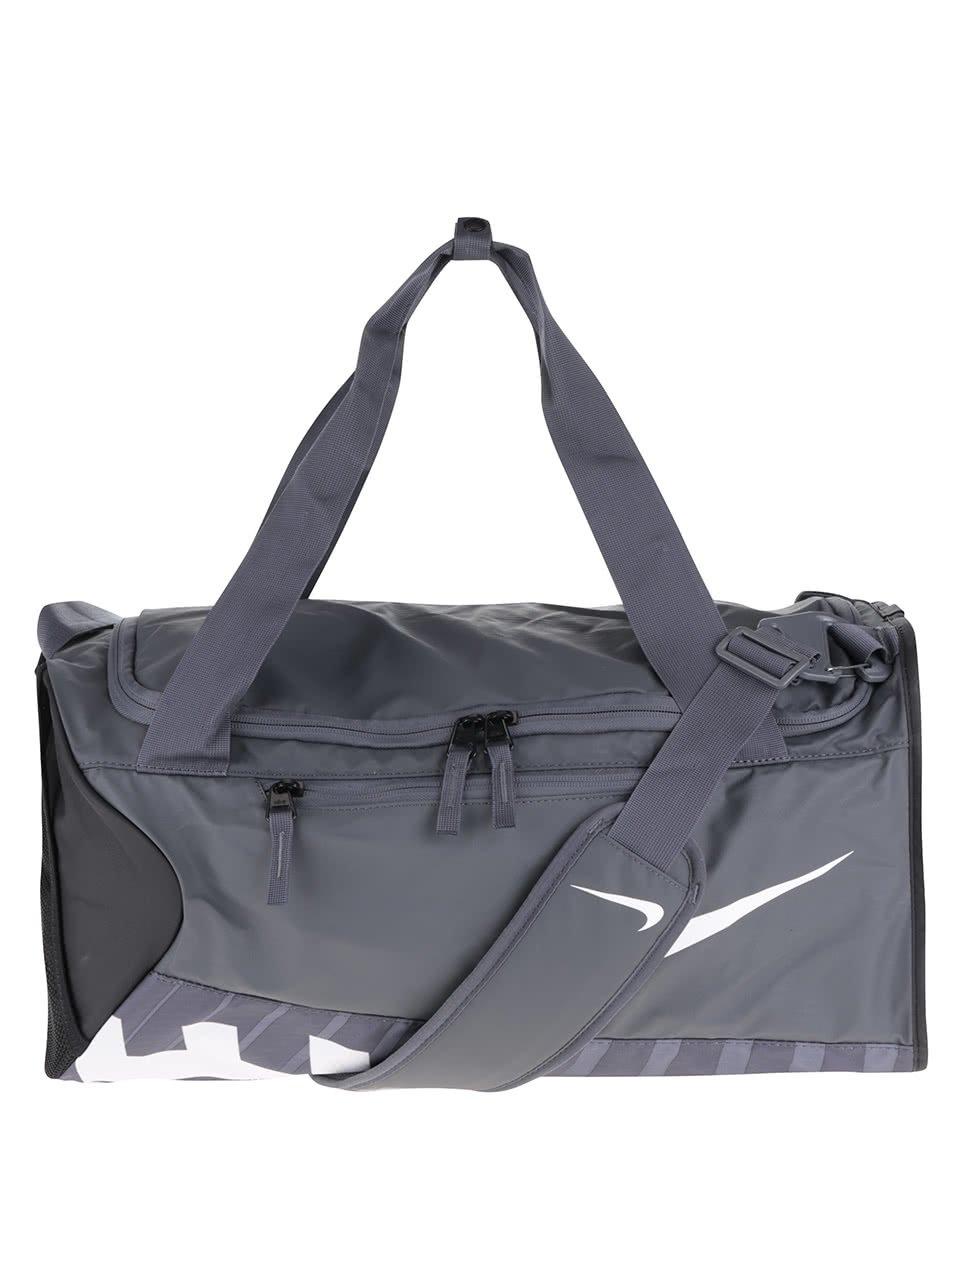 Černo-šedá sportovní taška s logem Nike Alpha